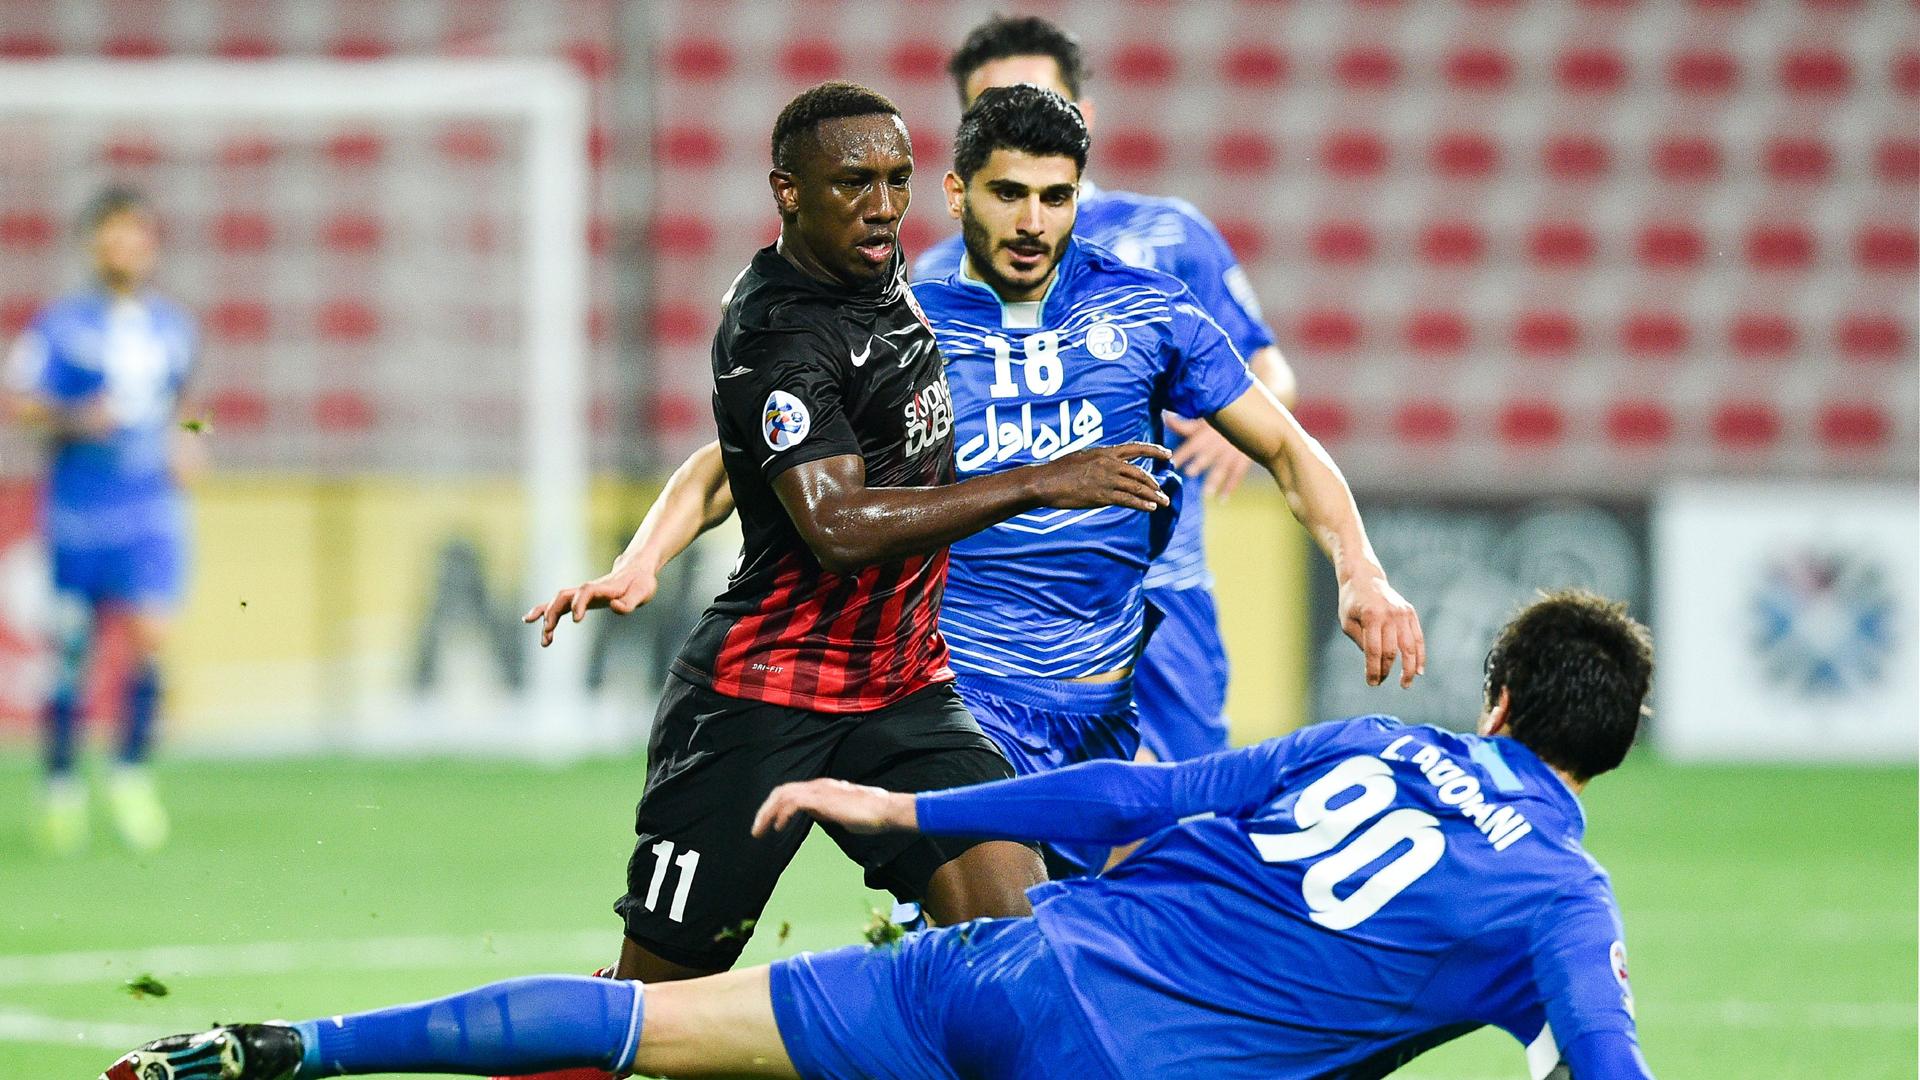 Al-Ahli Esteghlal AFC Champions League 2017